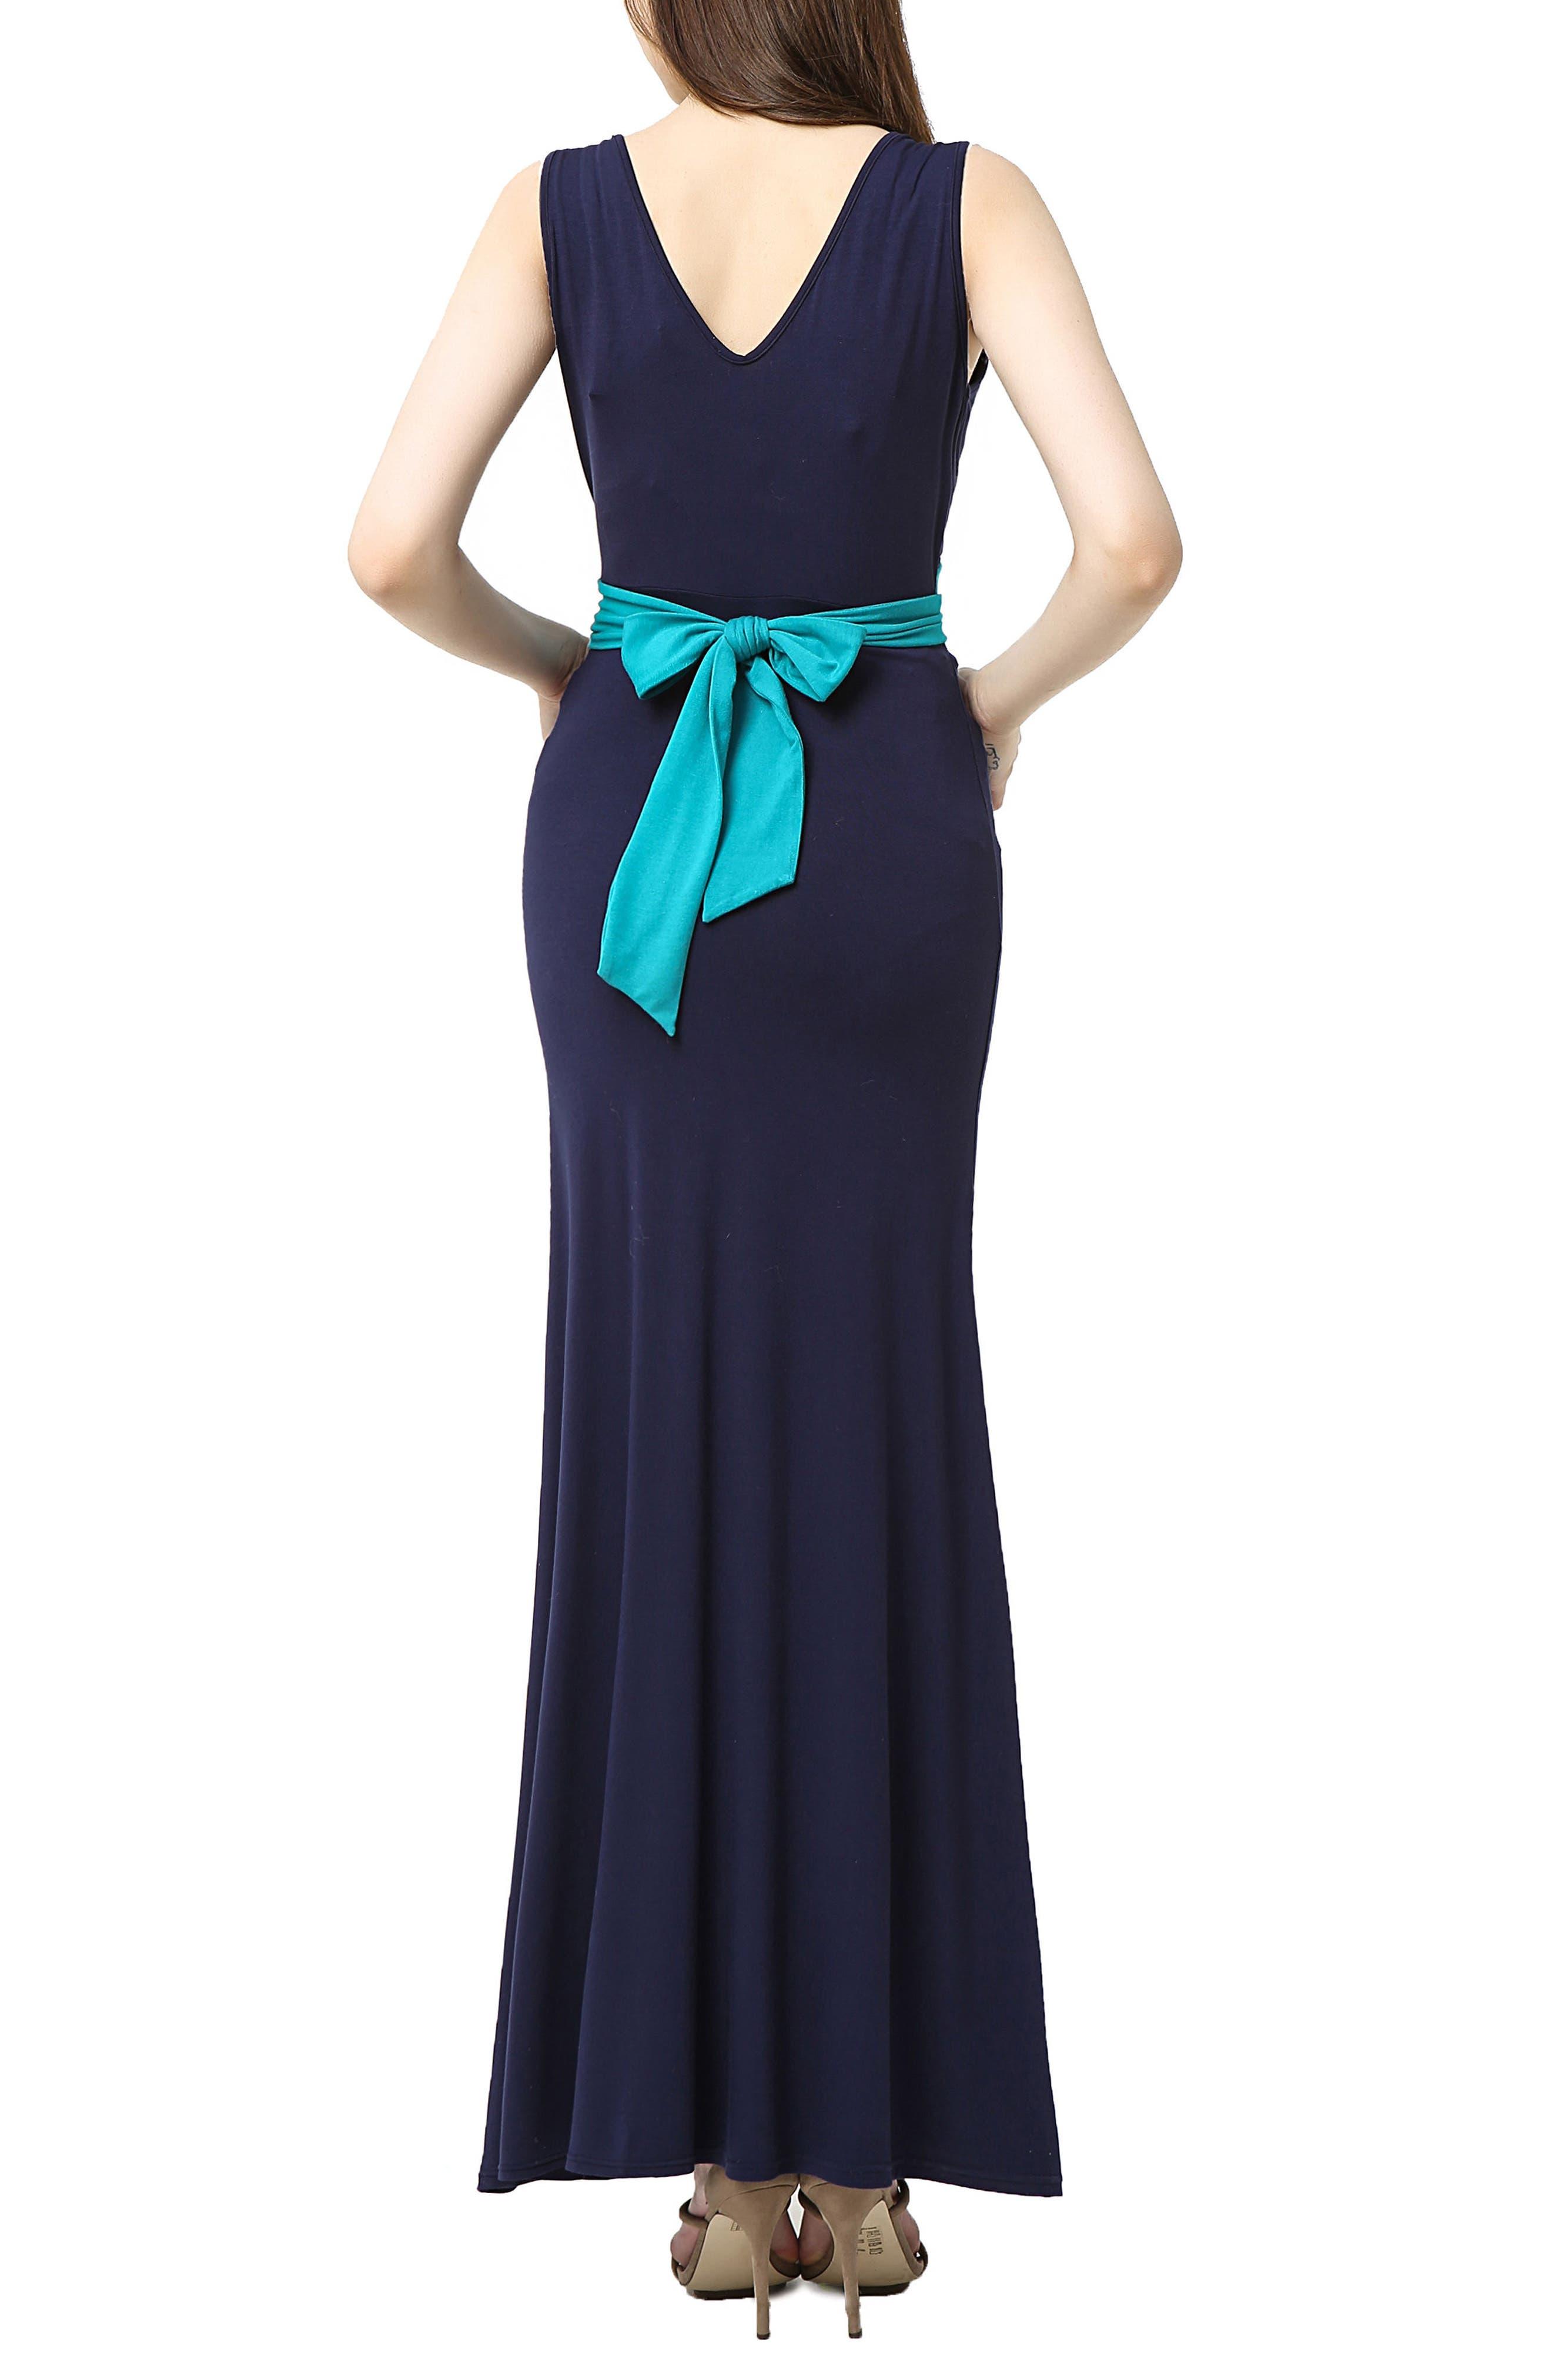 Scarlett Maternity Maxi Dress,                             Alternate thumbnail 2, color,                             Navy/ Teal